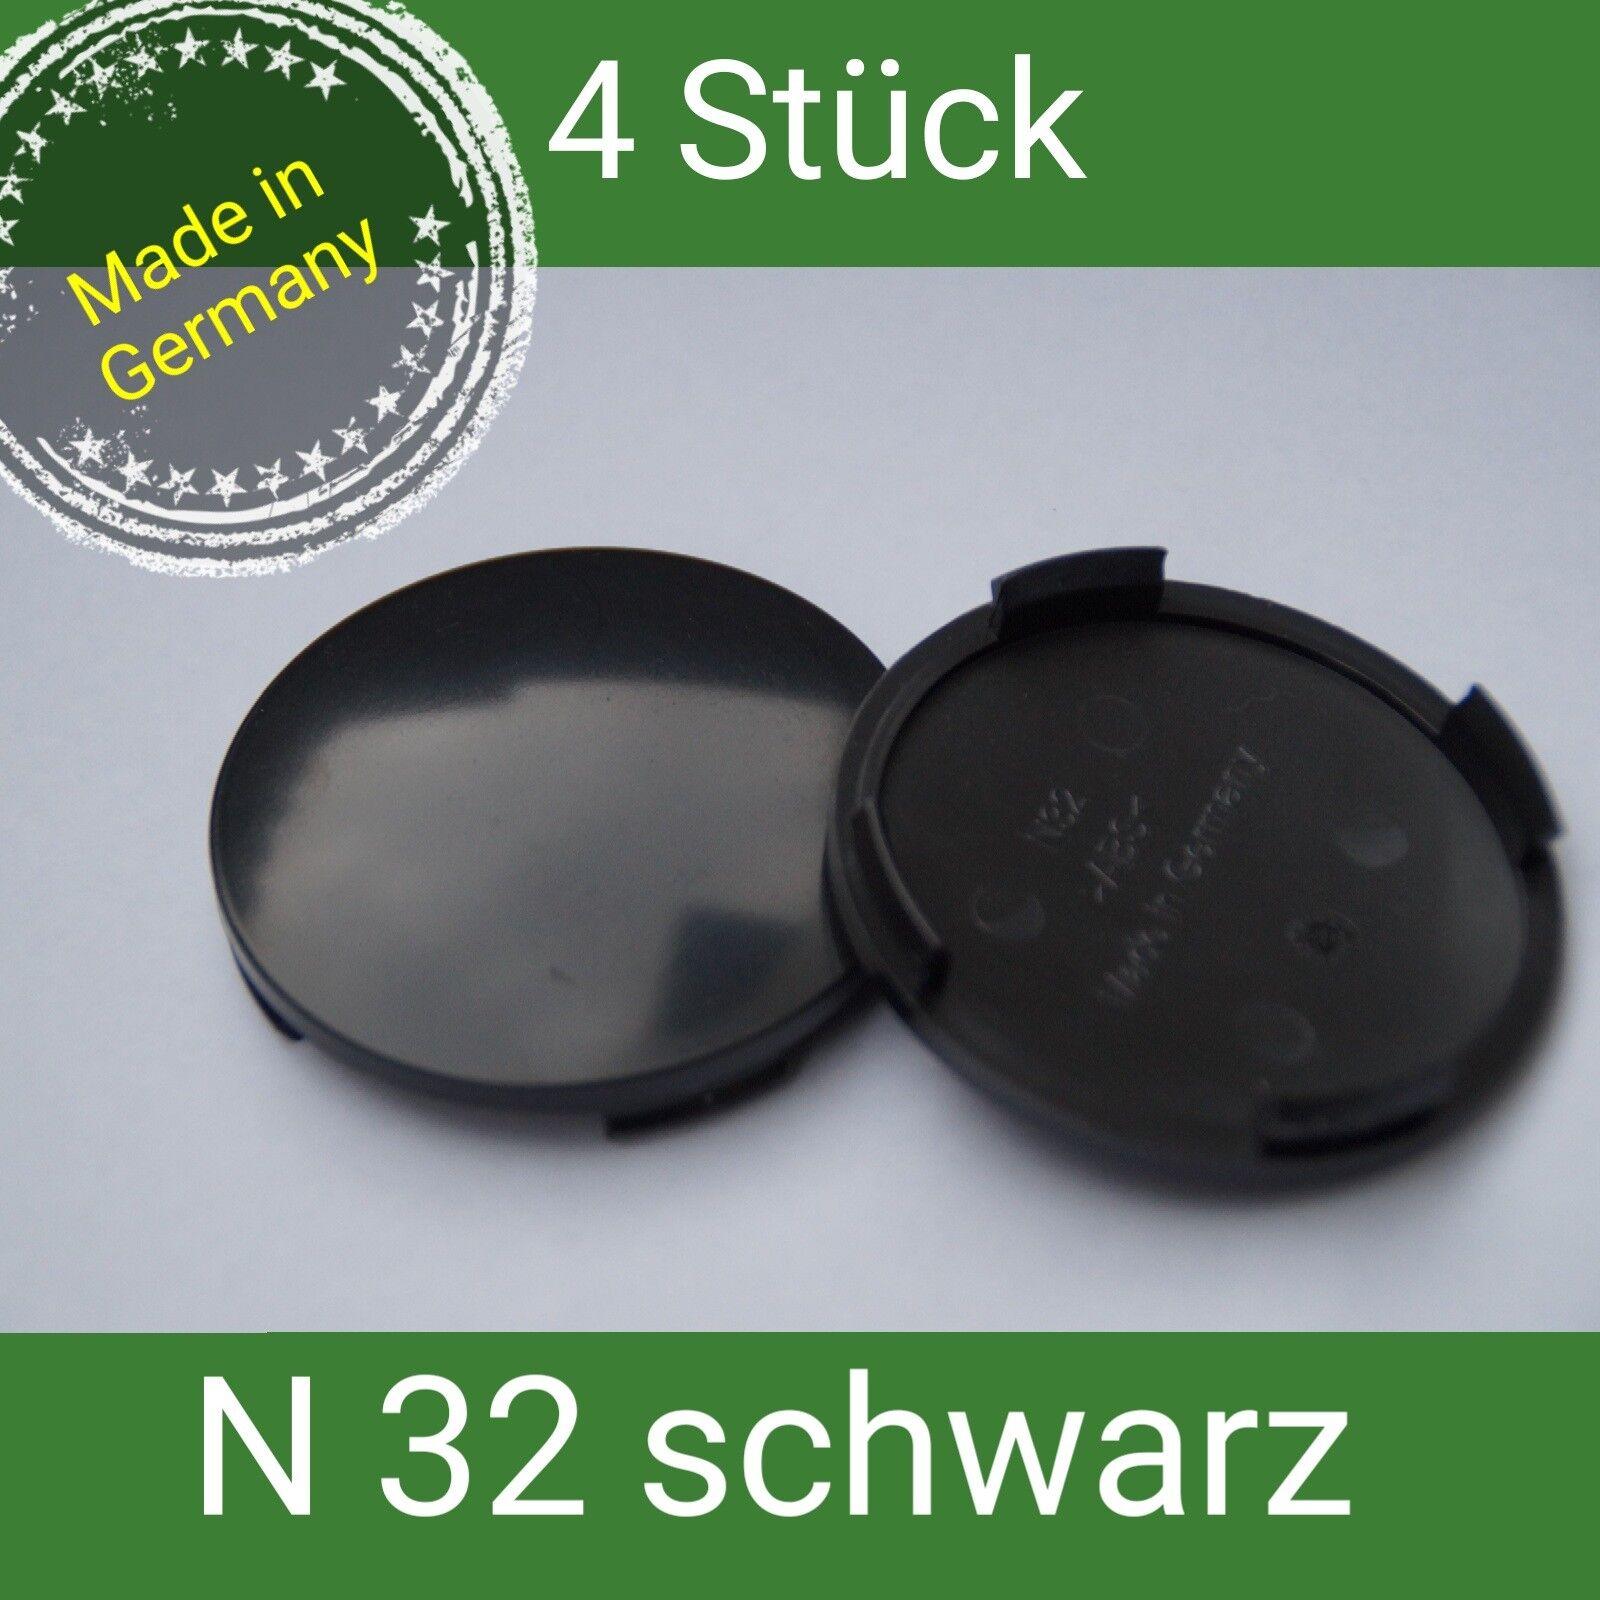 N 32  schwarz Nabenkappen  Felgendeckel 64 mm Rial Alutec  4 St.